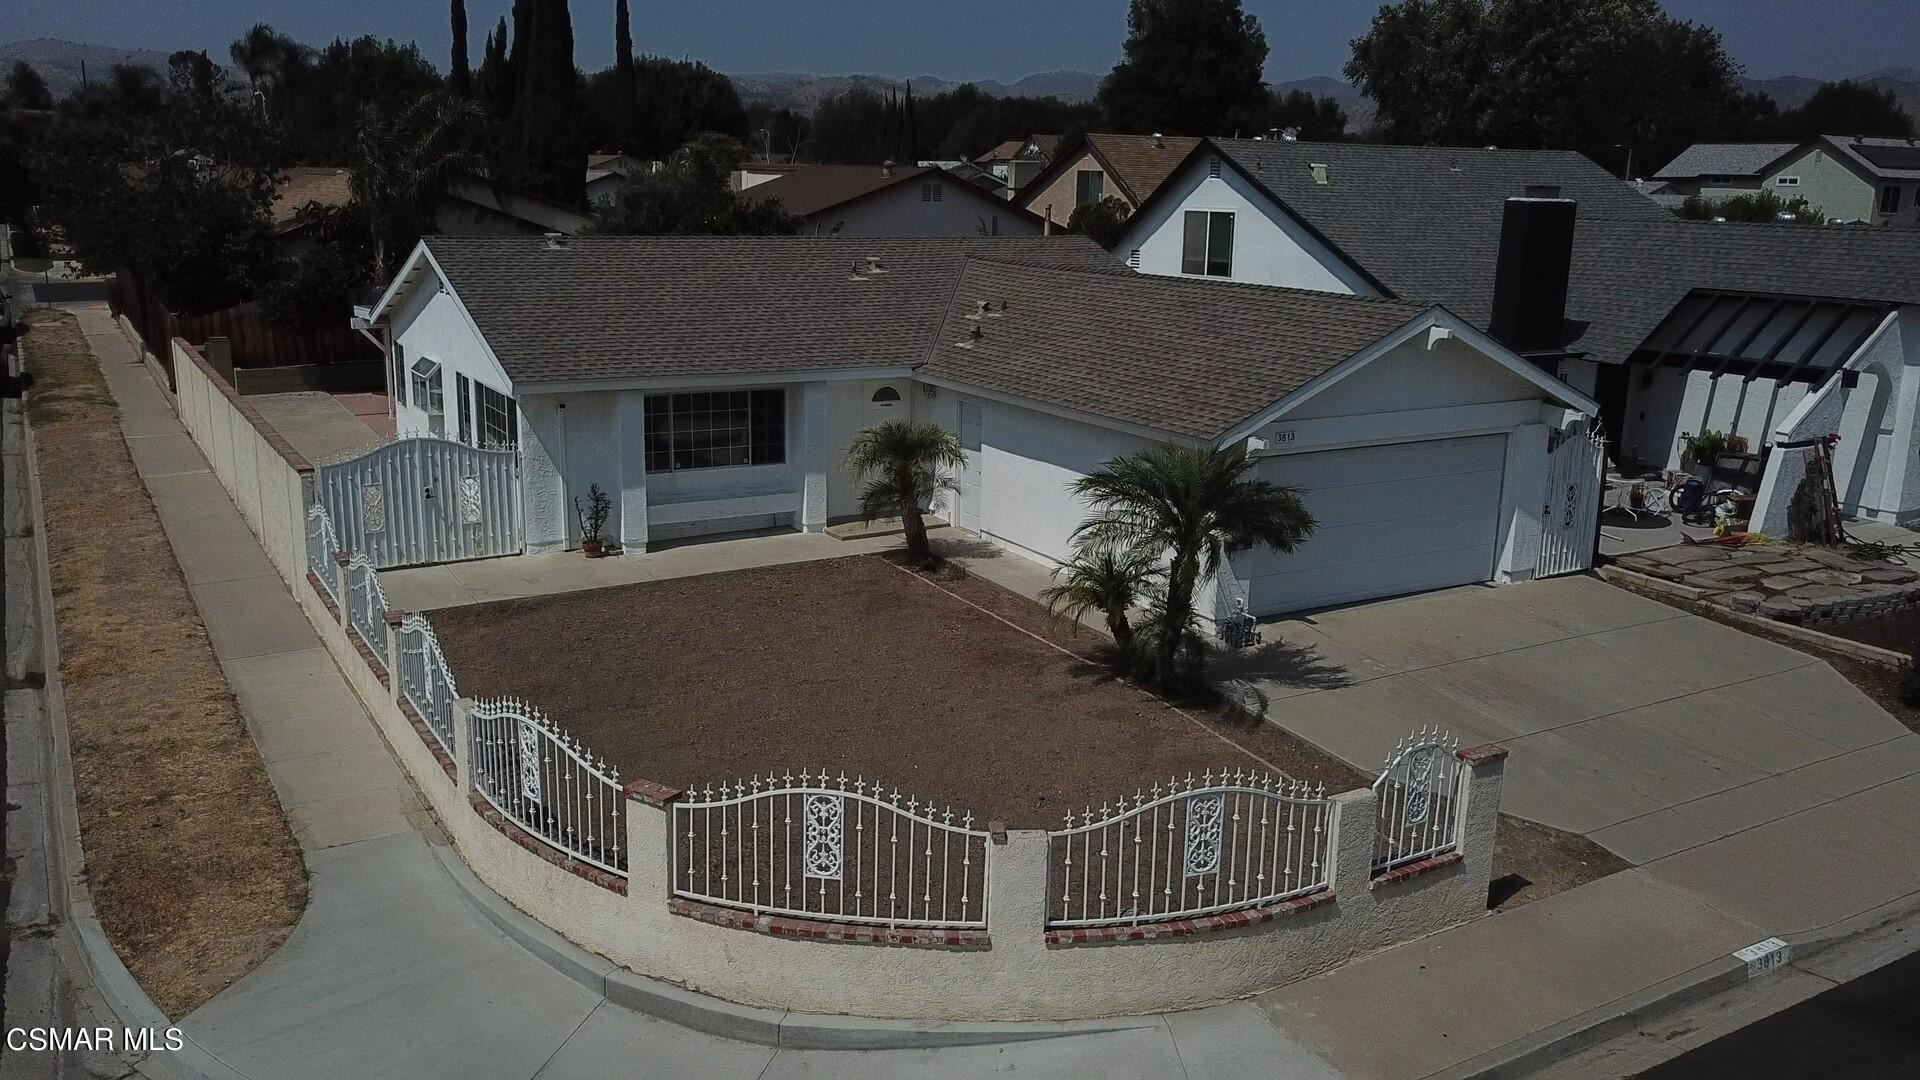 3813 Merrill Court, Simi Valley, CA 93063 - MLS#: 221003898